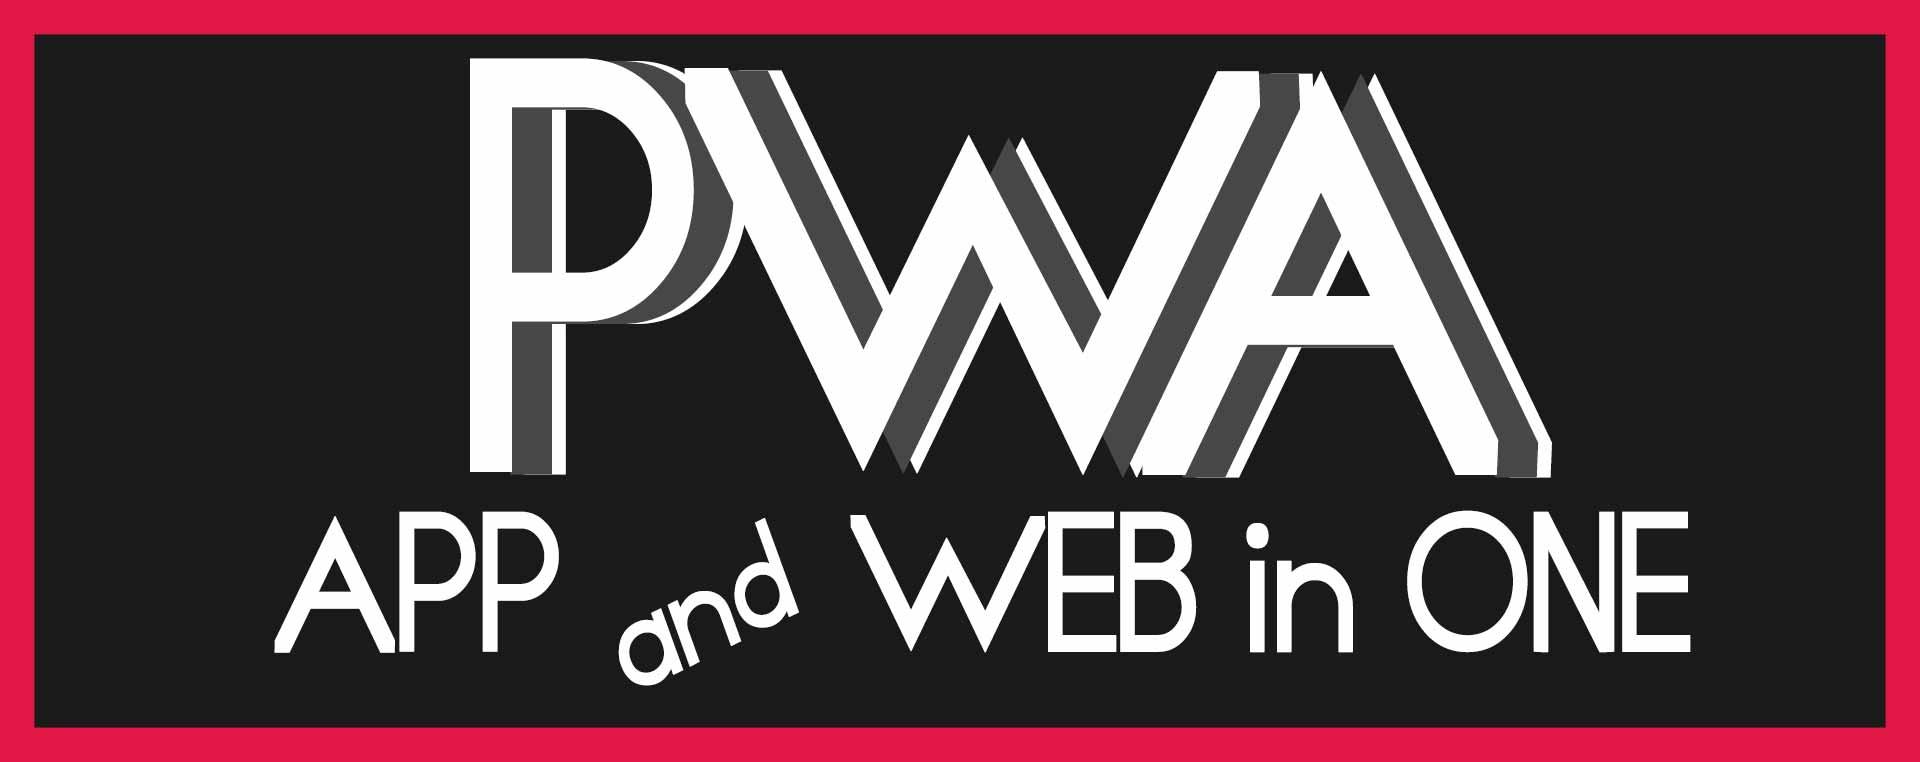 pwa app